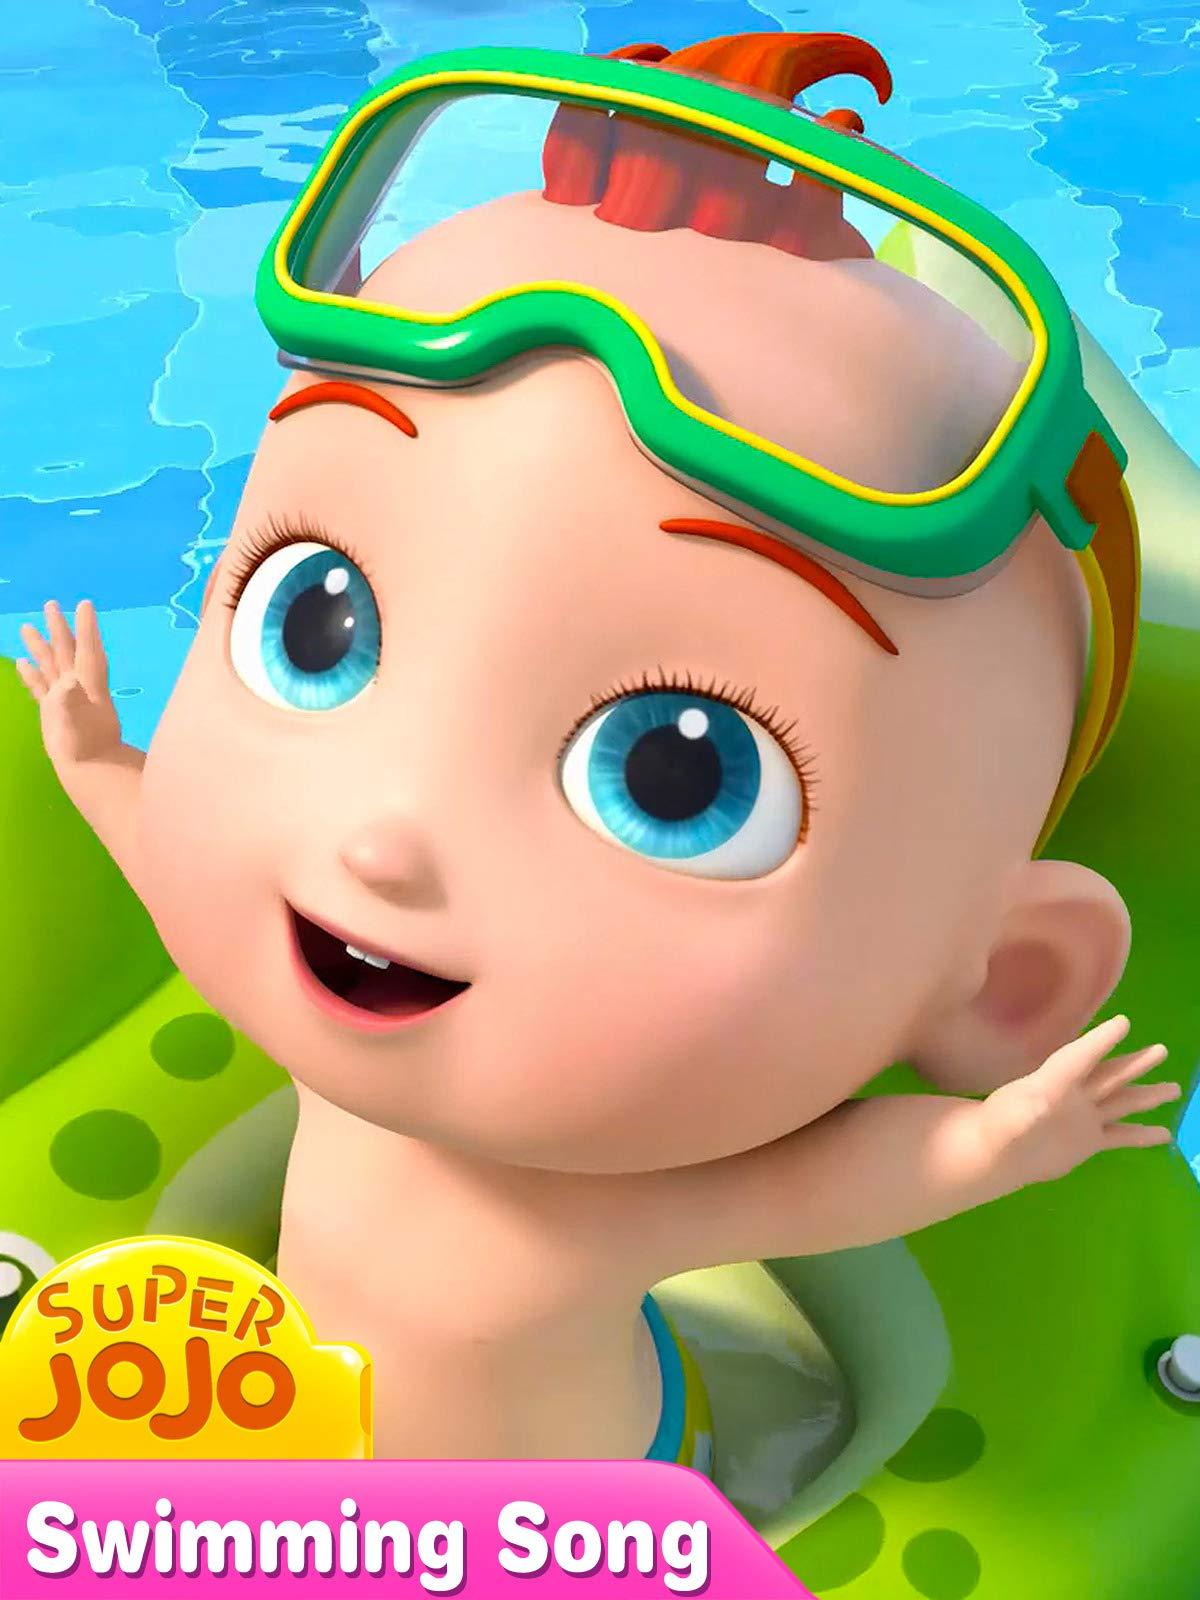 Super JoJo - Swimming Song